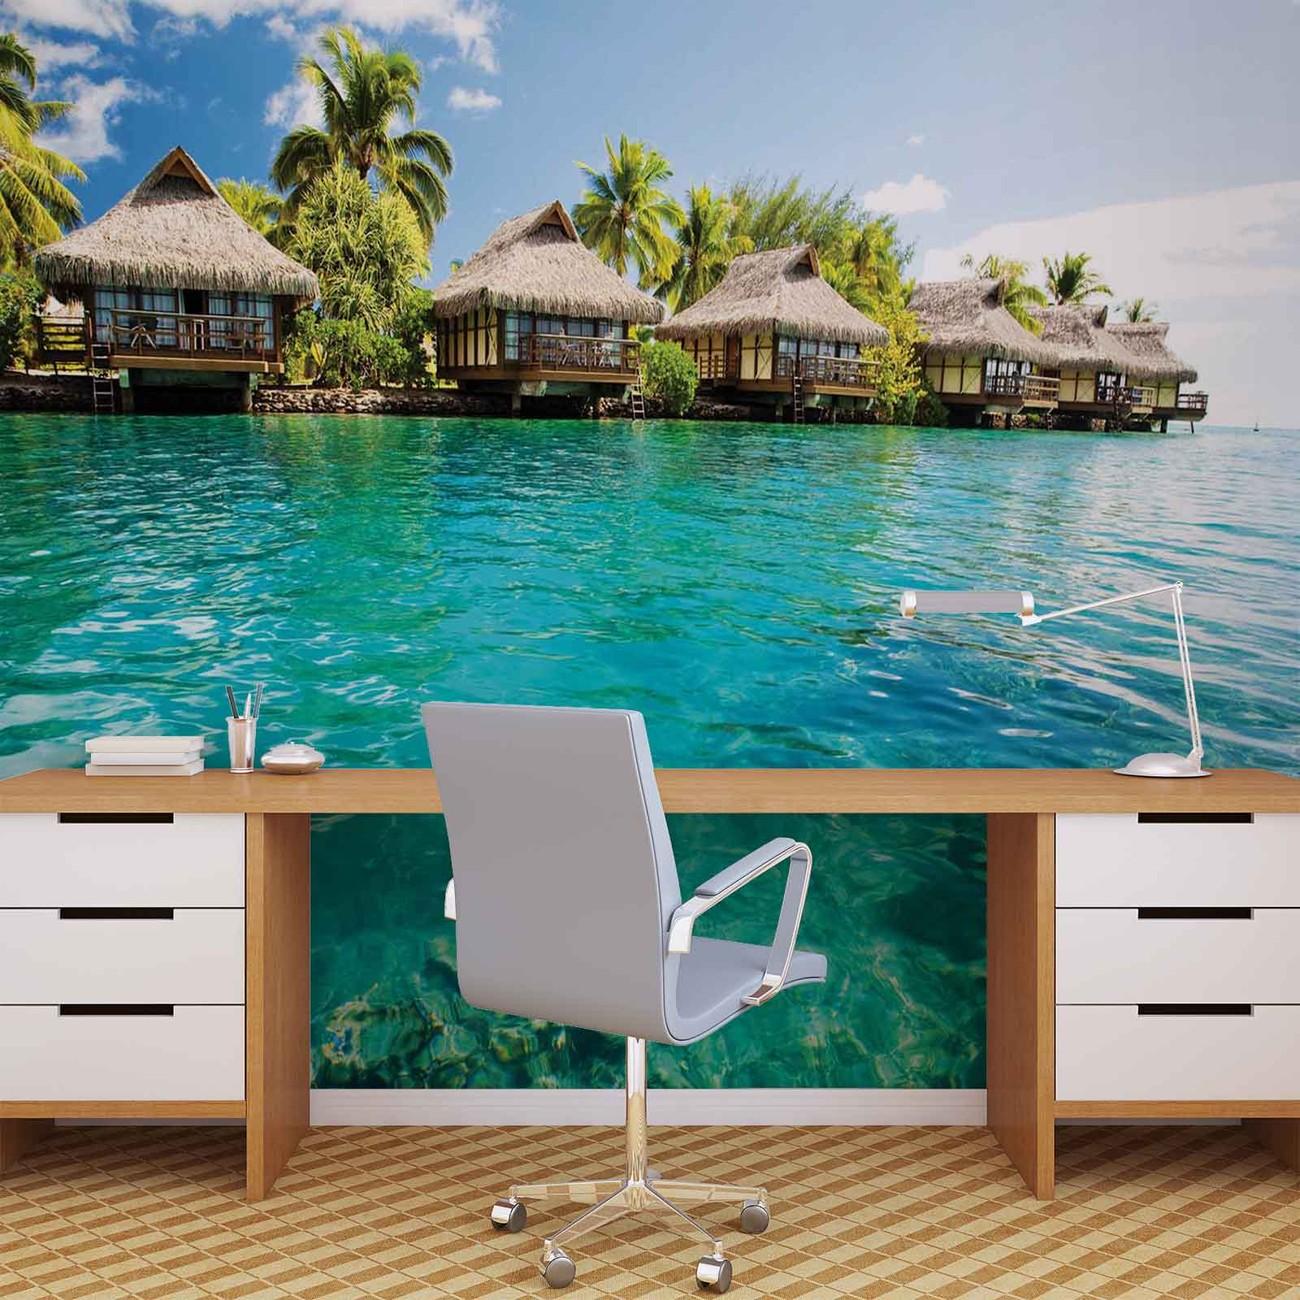 fototapete tapete insel karibik see tropische h tten bei europosters kostenloser versand. Black Bedroom Furniture Sets. Home Design Ideas